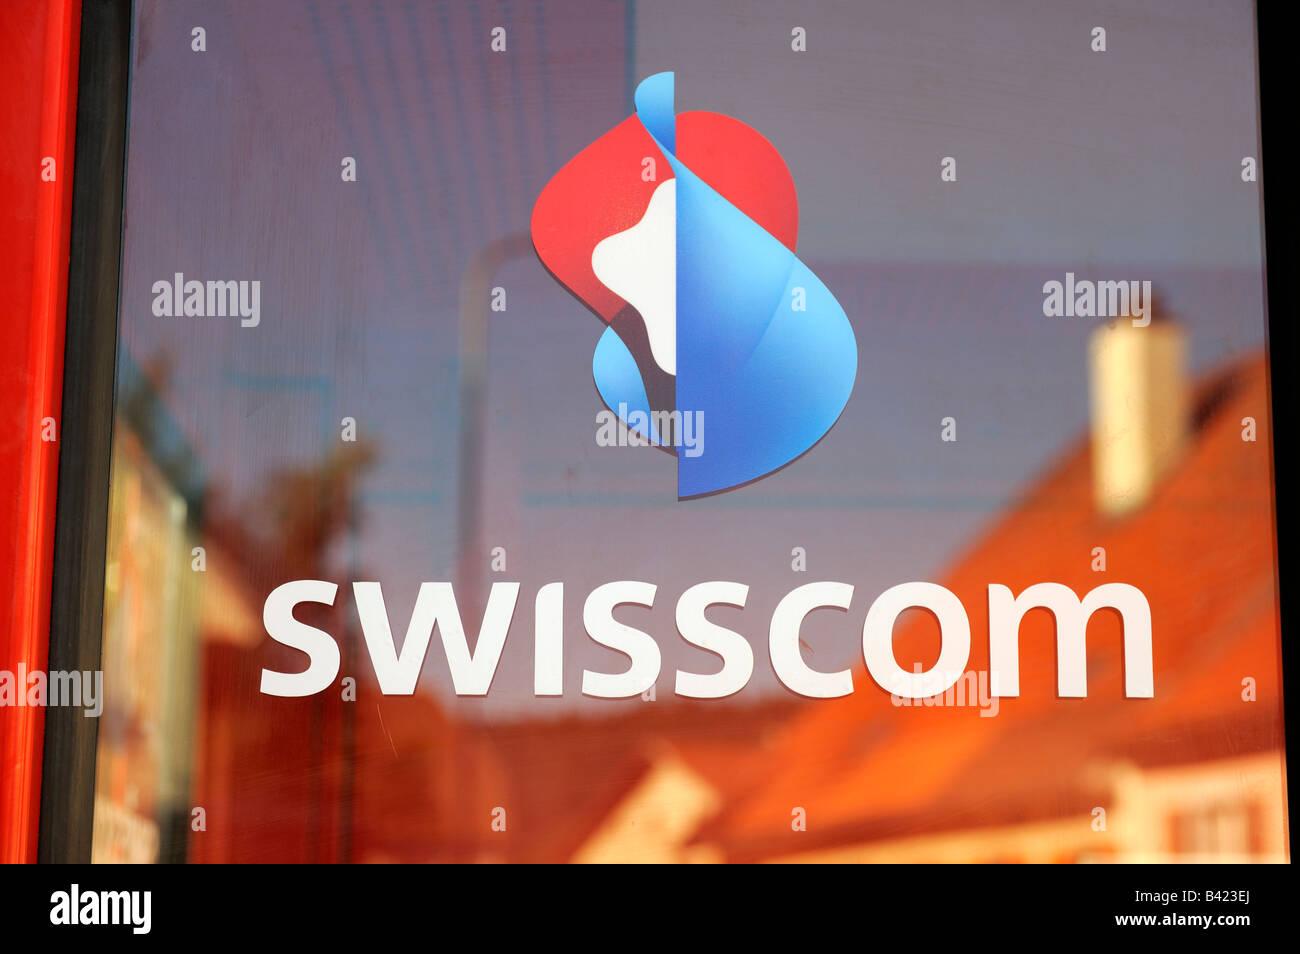 Swisscom Telephonetbooth in La Brevine, Switzerland - Stock Image